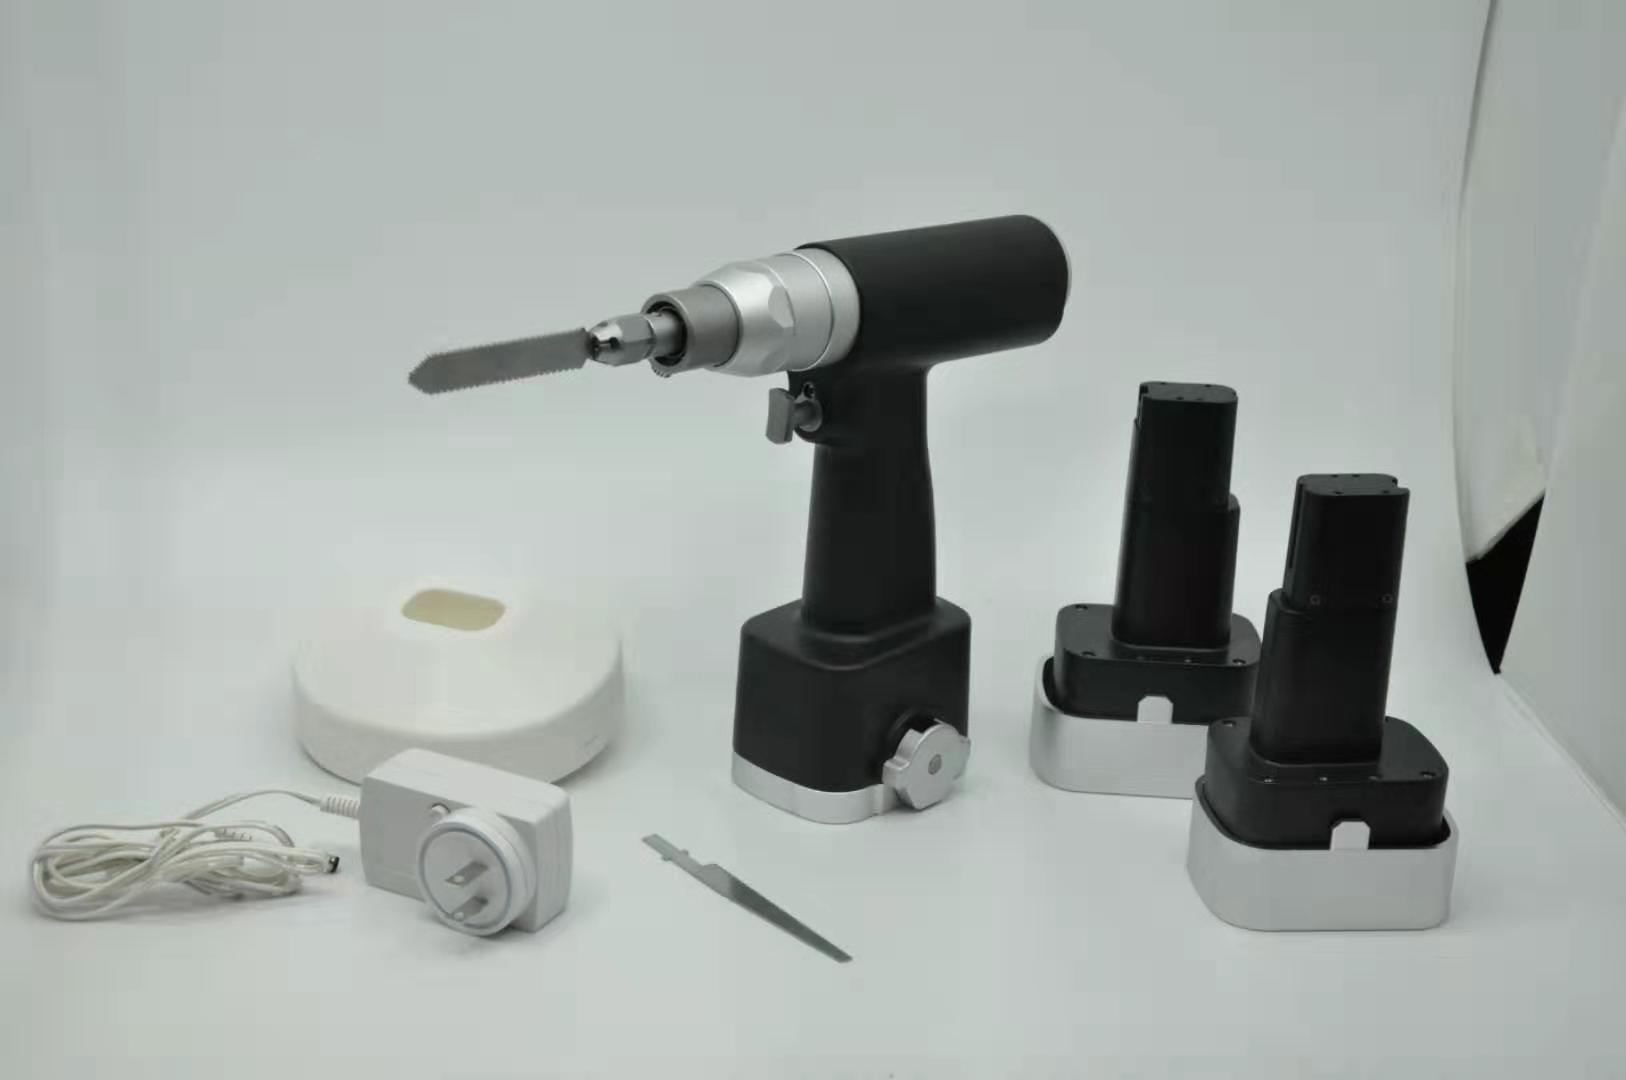 Orthopedic Electric Reciprocating Saw Orthopedics Surgical Instruments